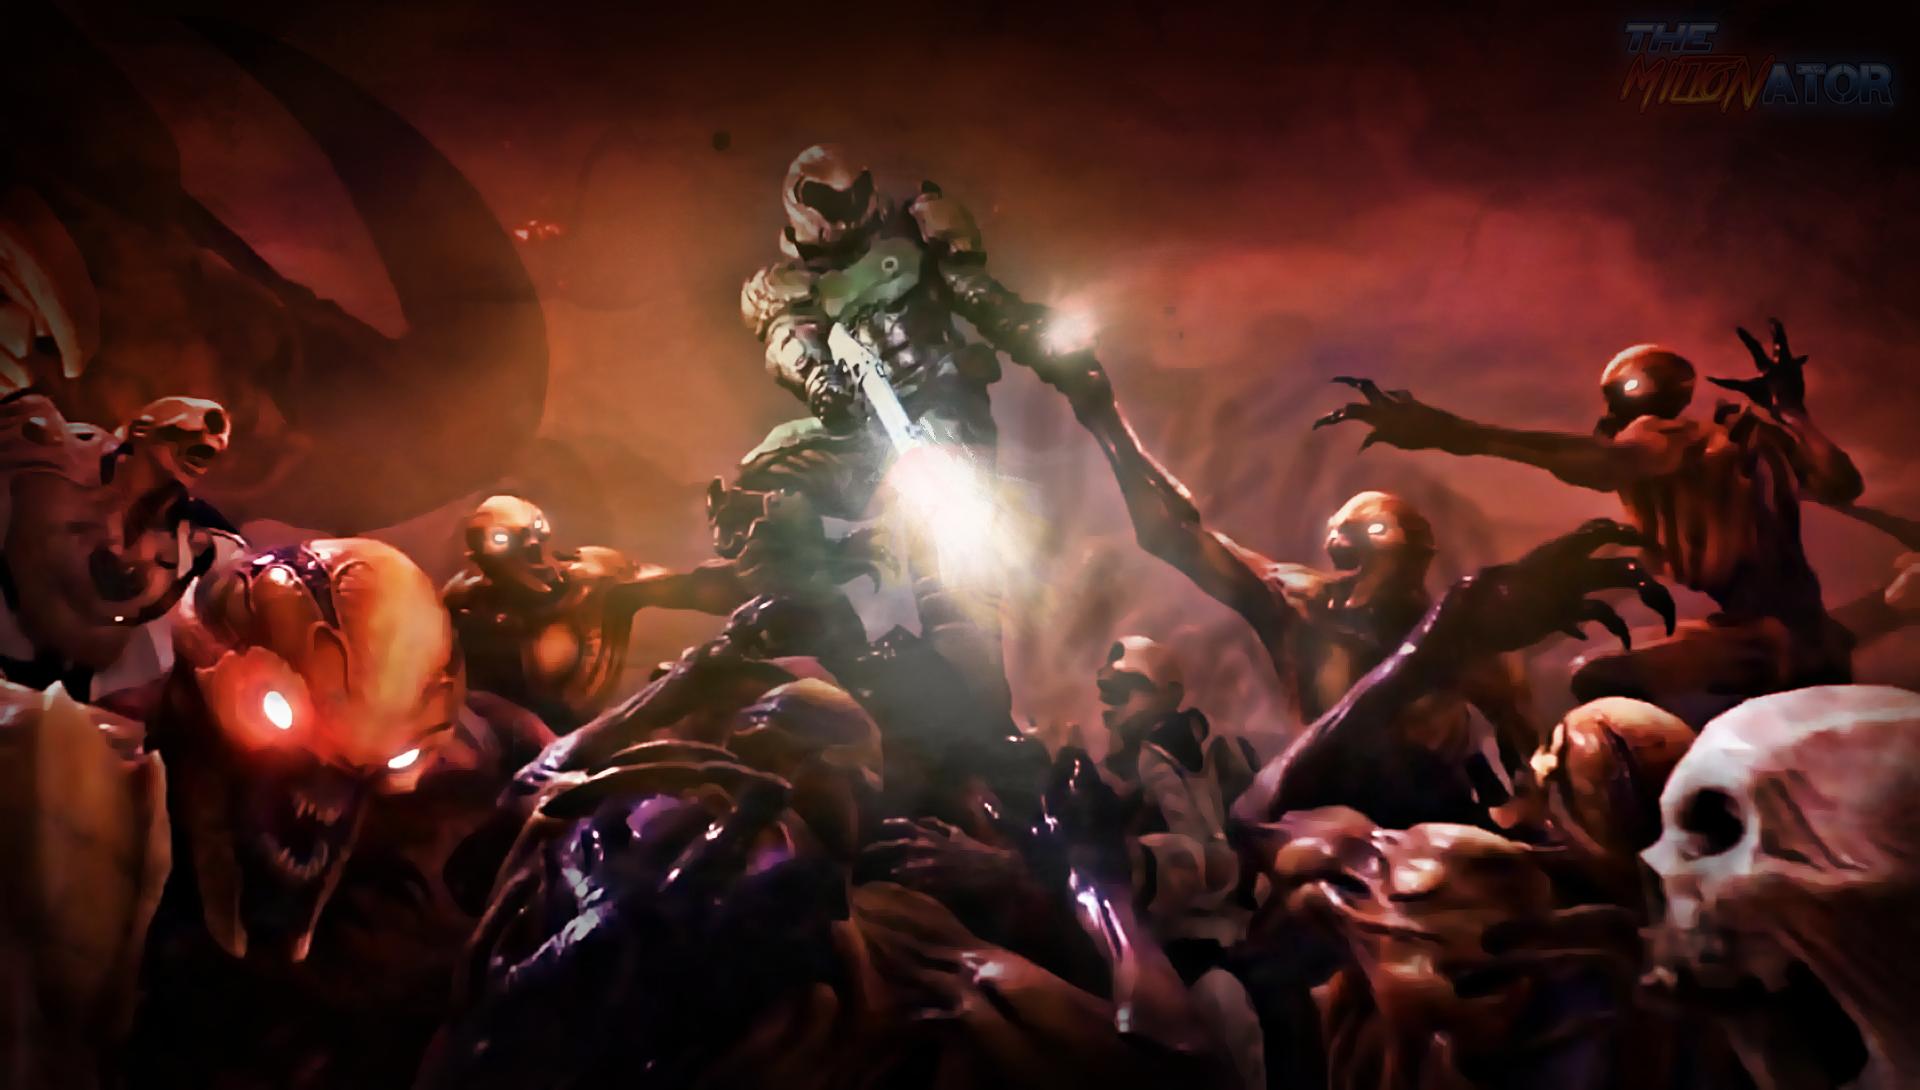 Doom 4 Wallpaper Miltonator Atmosphere By Miltonator On